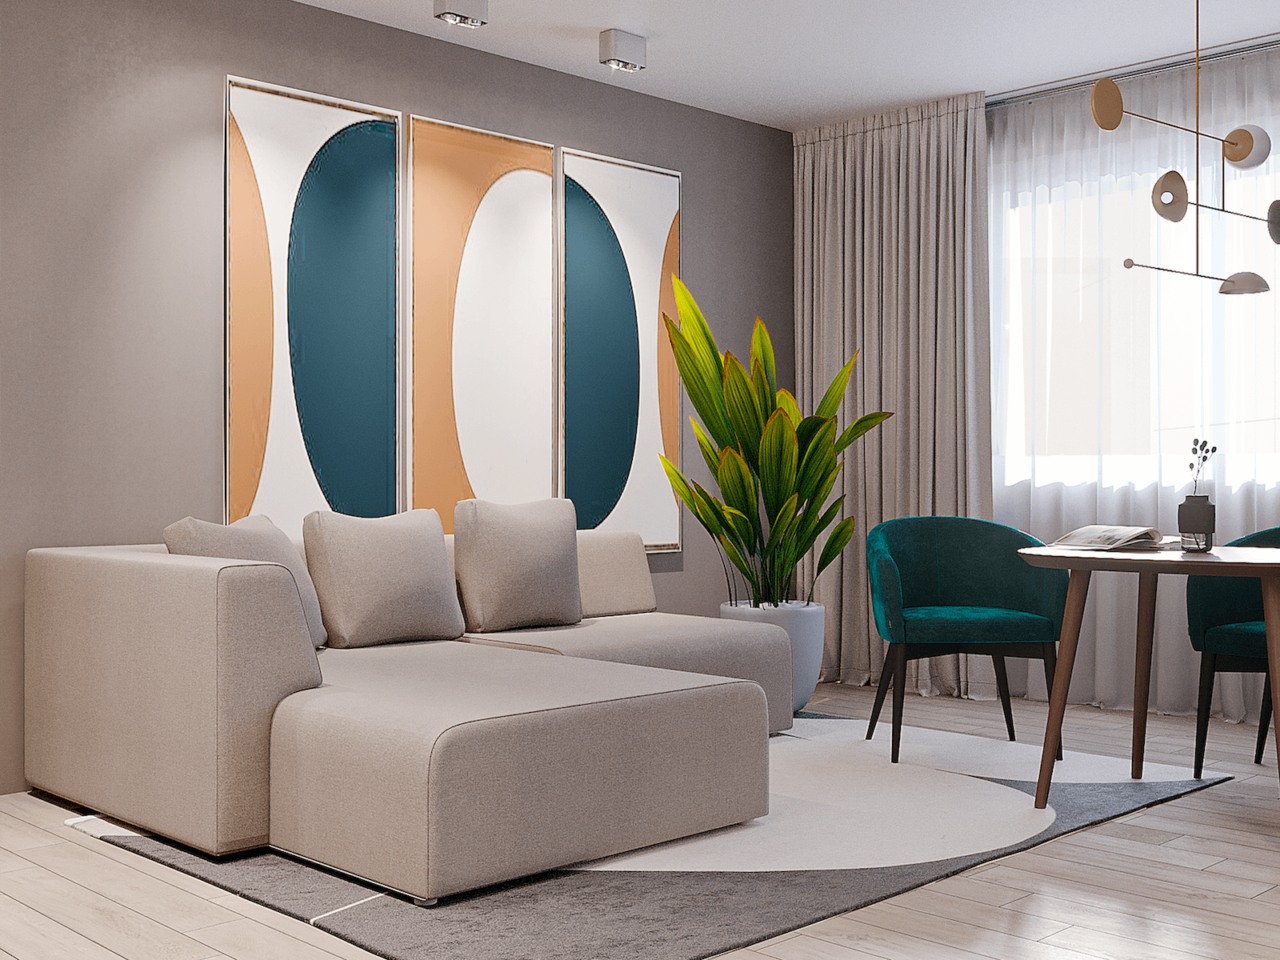 Дизайн проект двухкомнатной квартиры, бирюзовій акцент, Киев | фото 13